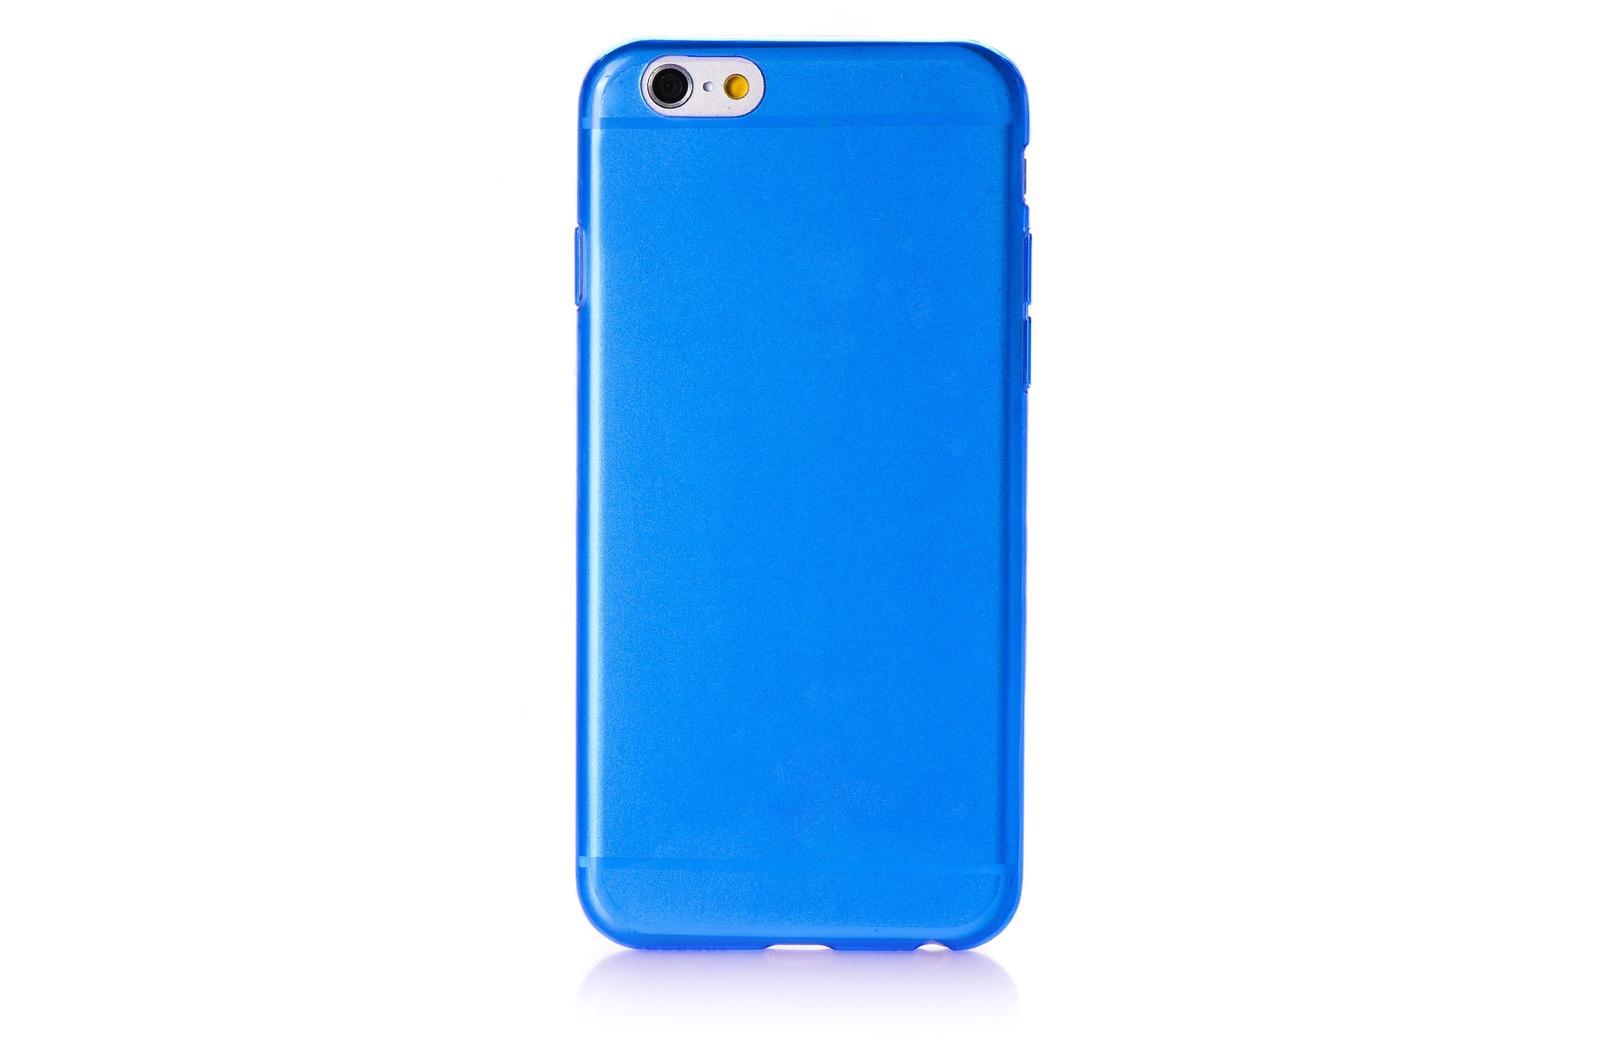 цены на Чехол для сотового телефона Gurdini Чехол накладка iPhone 6/6S 4.7